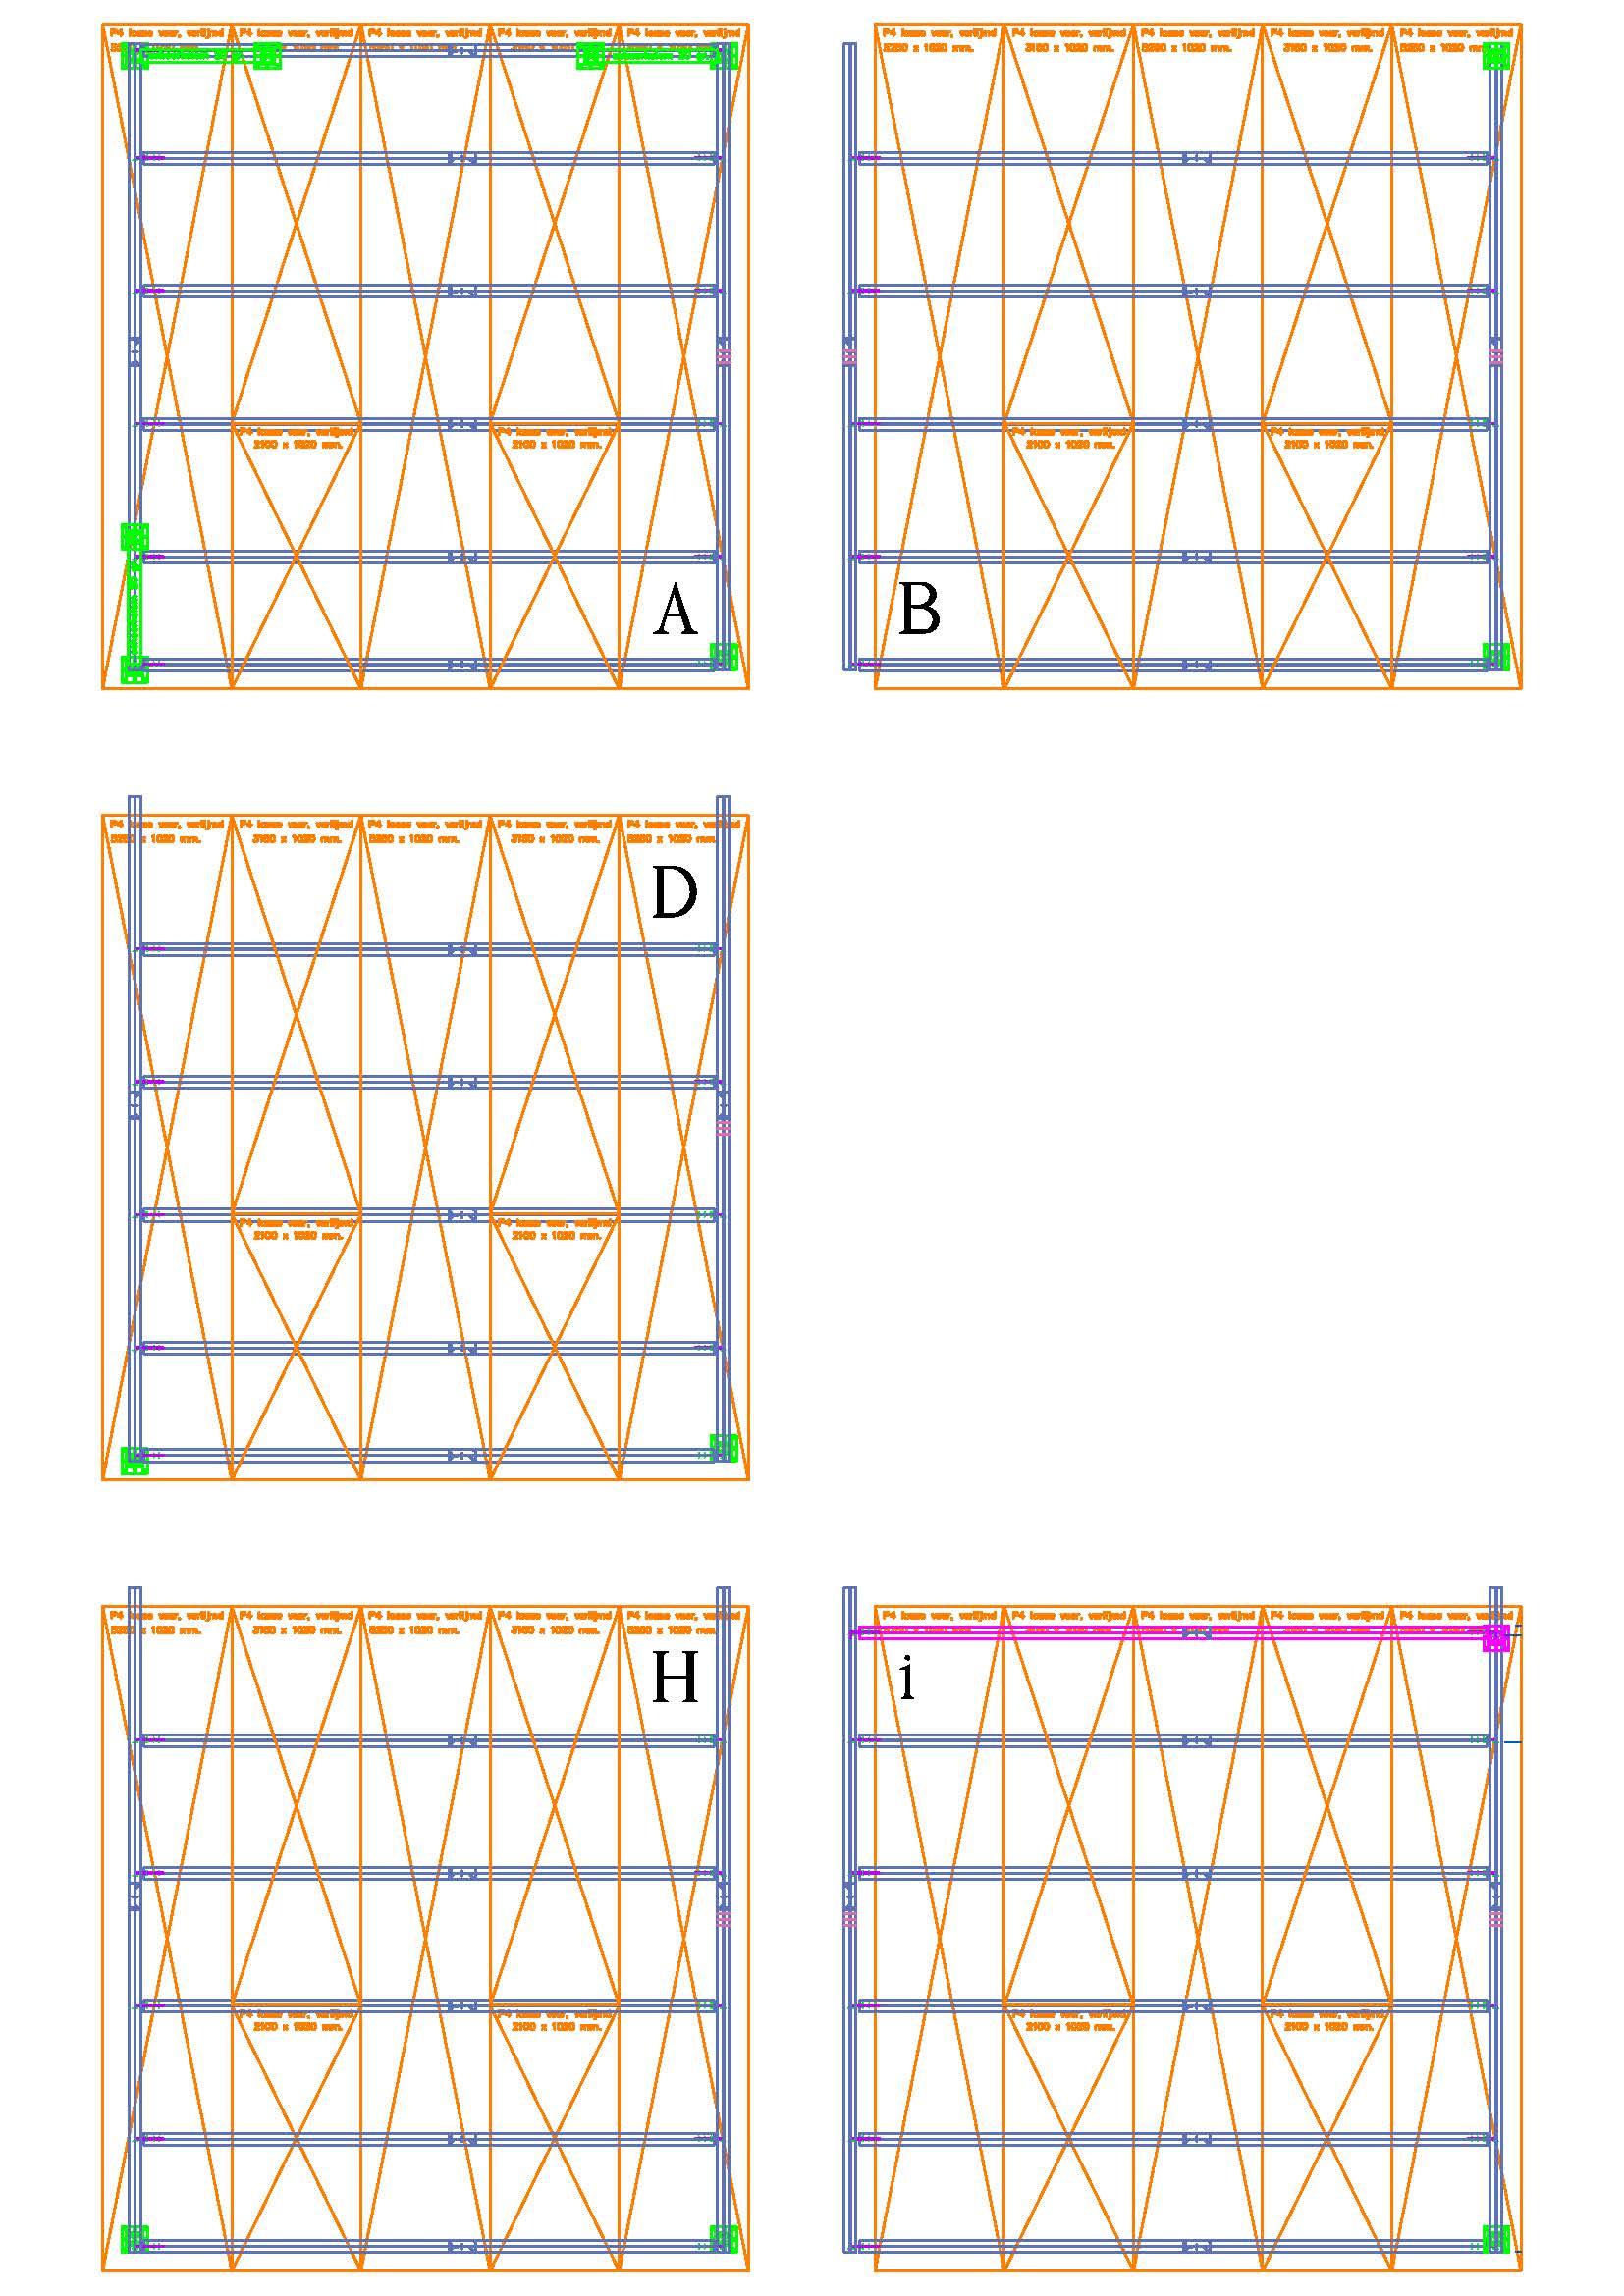 Mezzanine-tussenvloer-bordes-entresol-industrieel-platform